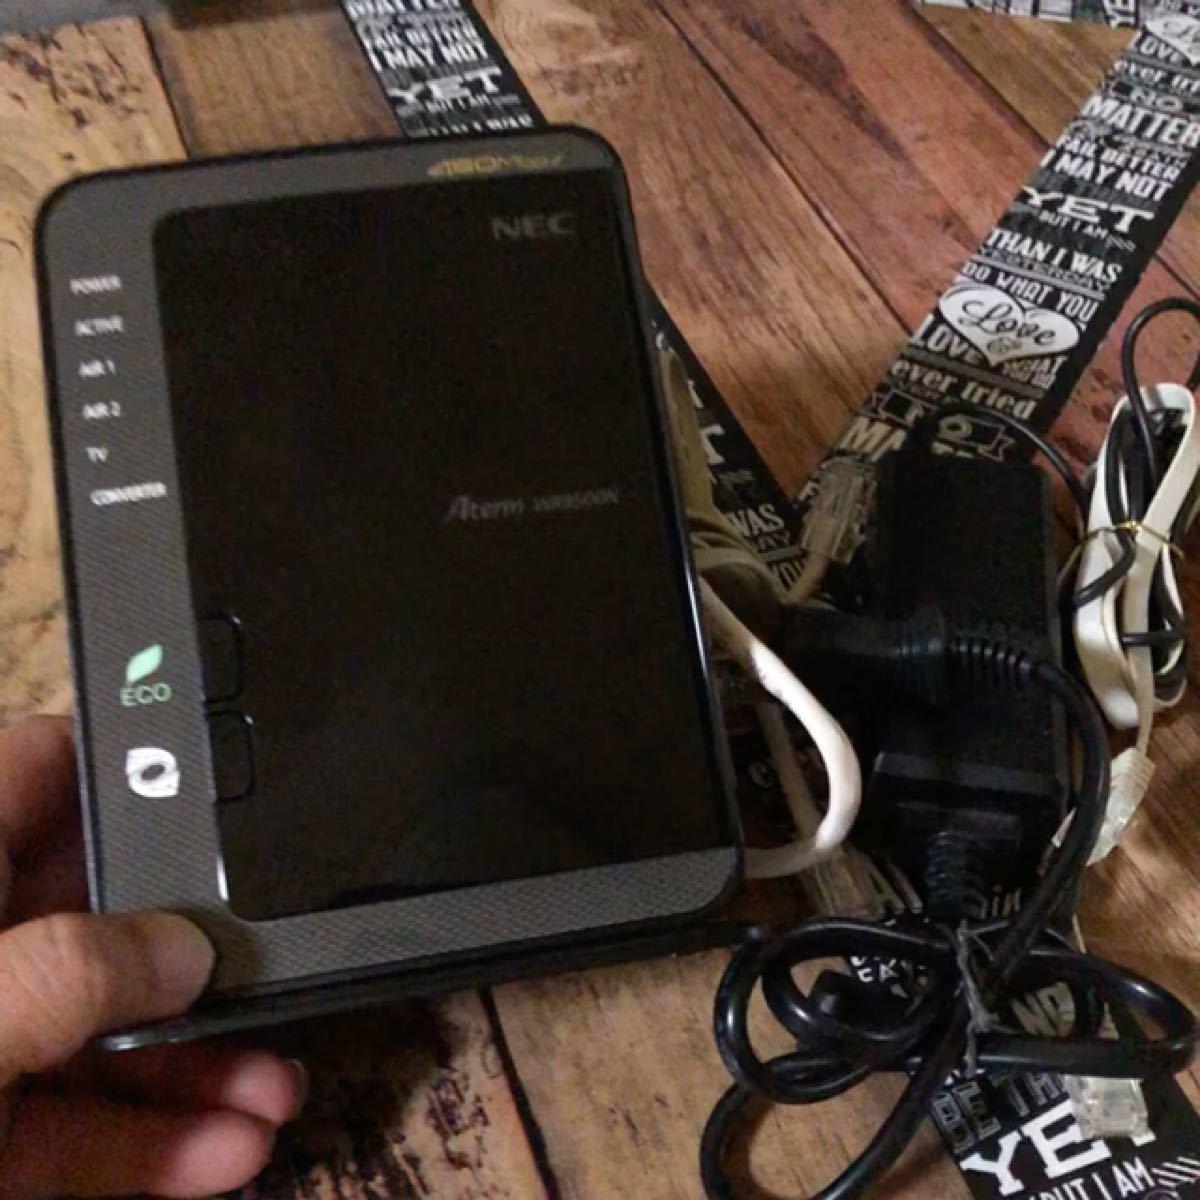 NEC/Aterm WR9500N/Wi-Fiルーター/無線LAN/ケーブル類欠品無し